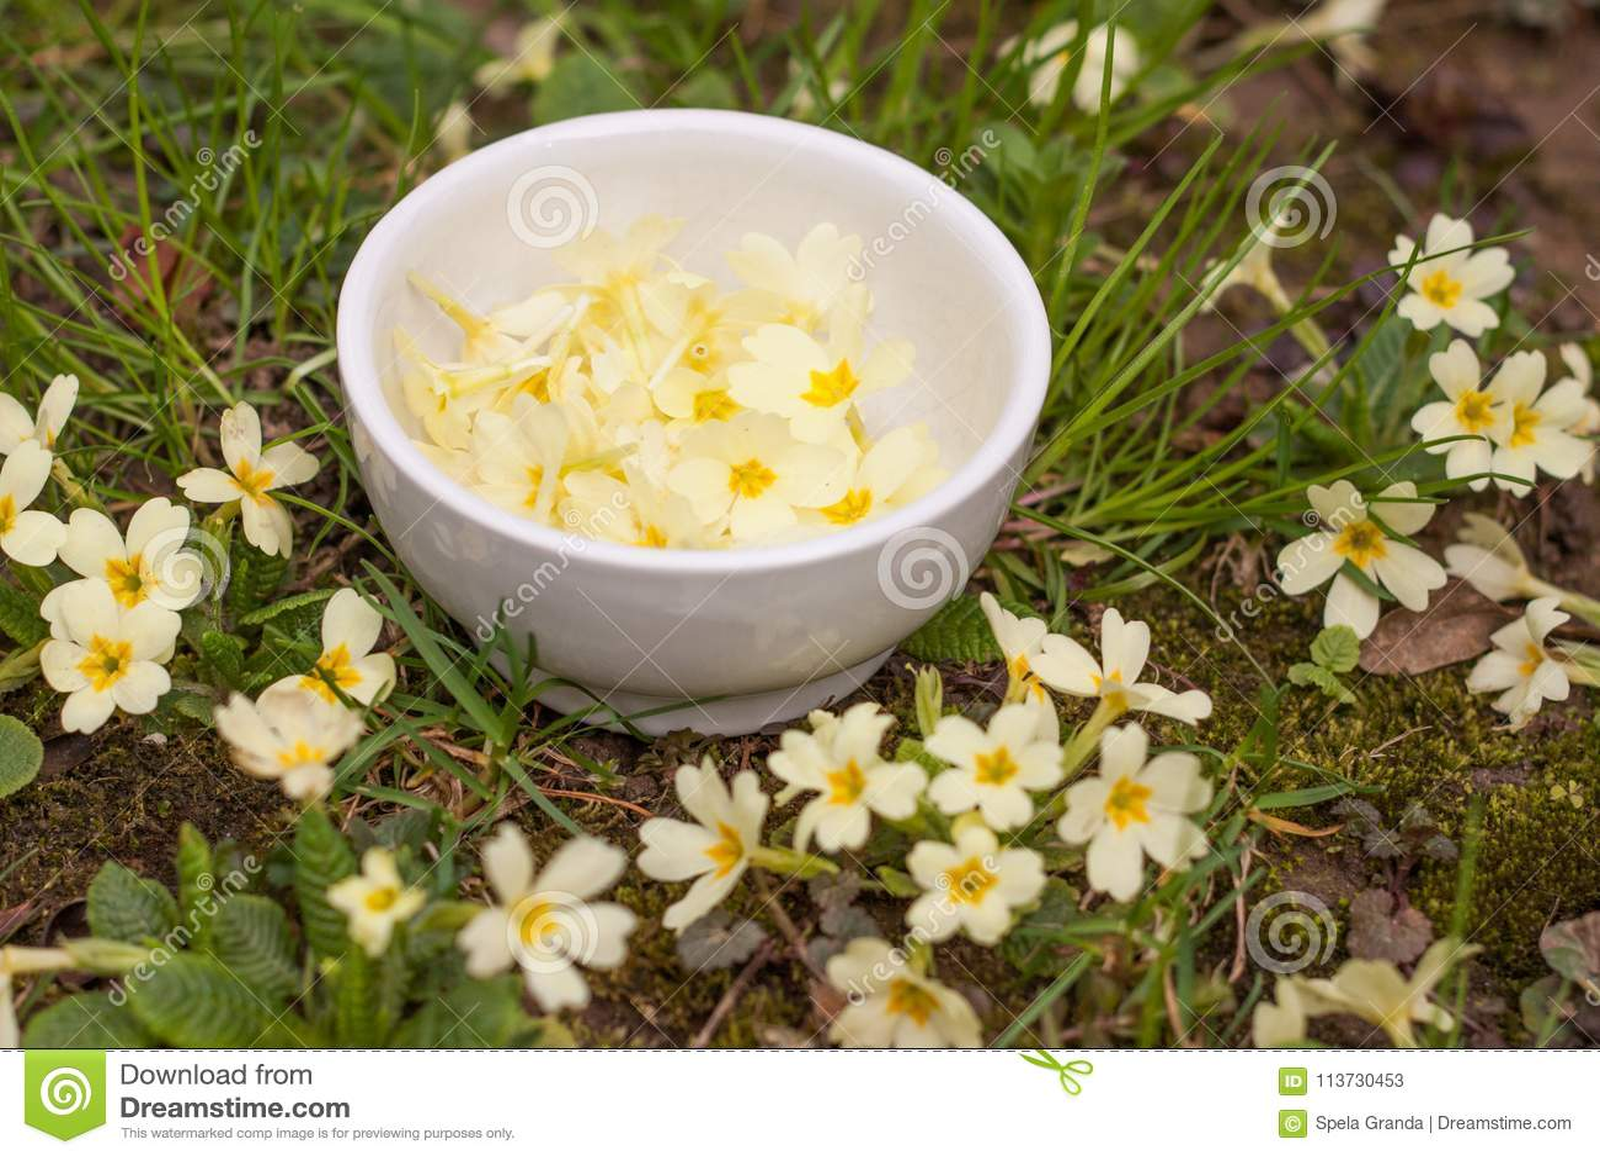 Handpicked Primrose Flowers Used As Salad Decoration Stock Image